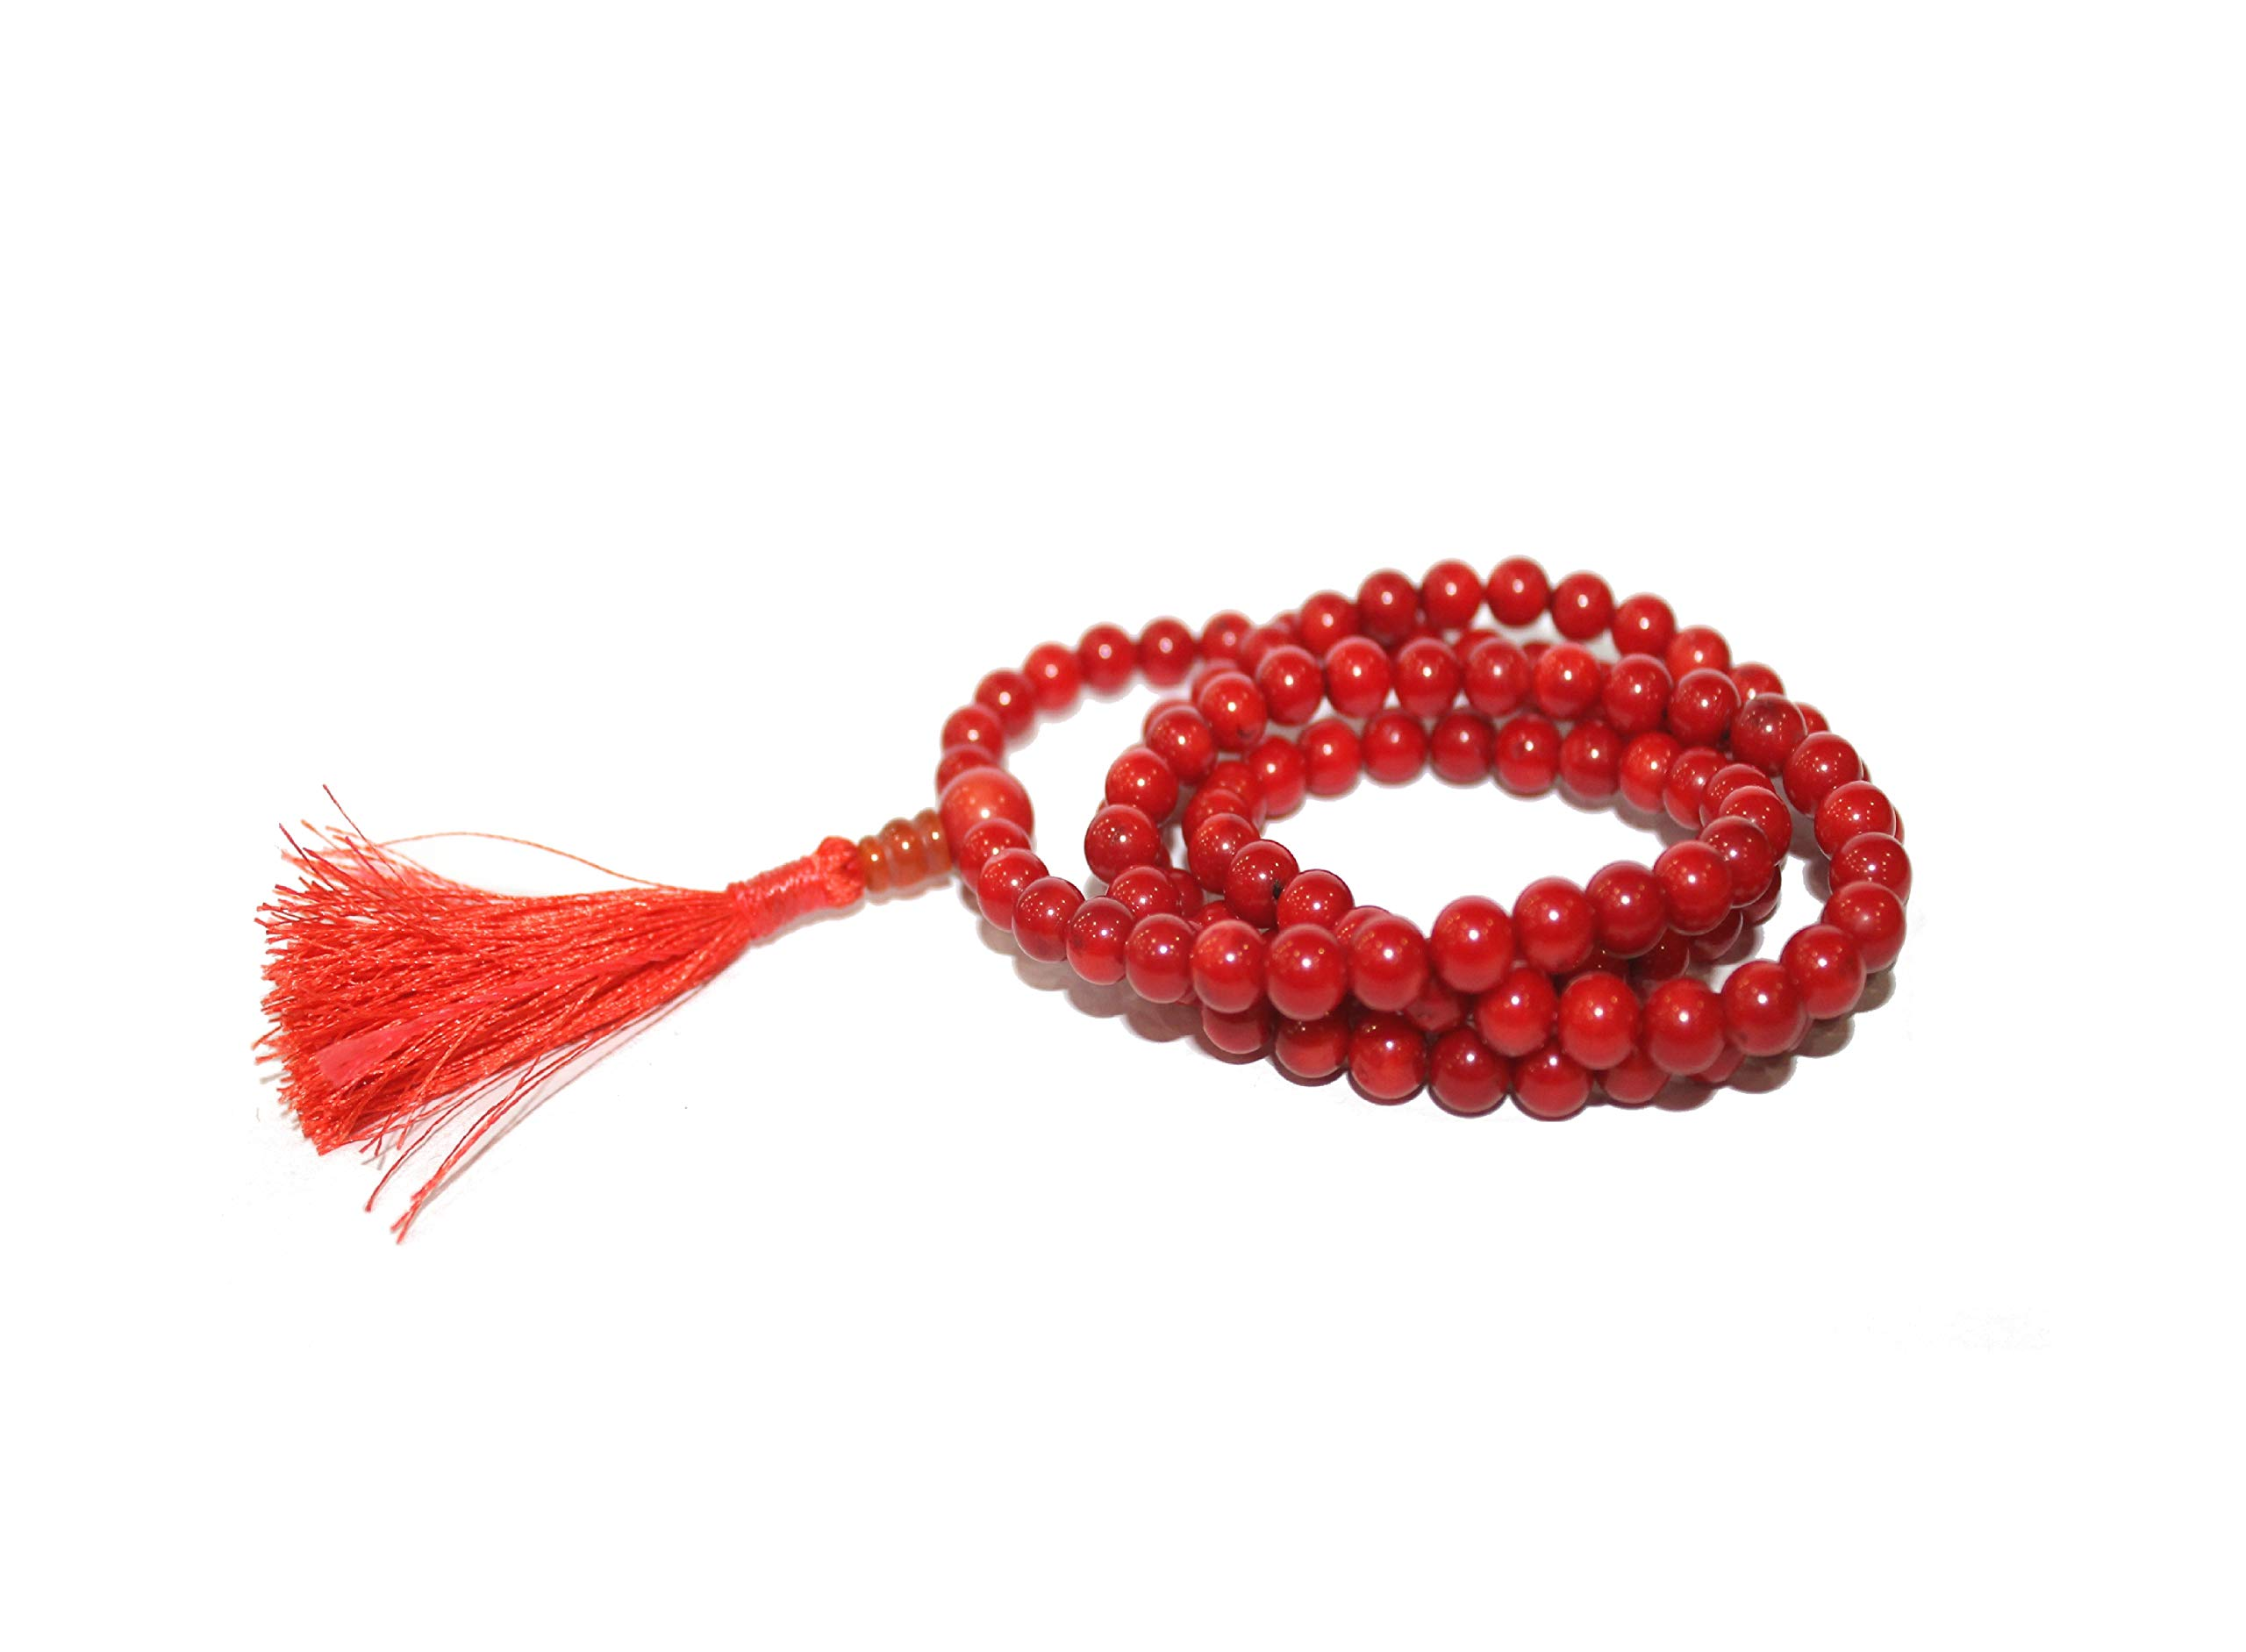 IndianStore4All Red Coral (Moonga) Japa Mala 7mm 108+1 Guru Bead Handmade Meditation Mala Prayer Necklace by IndianStore4All